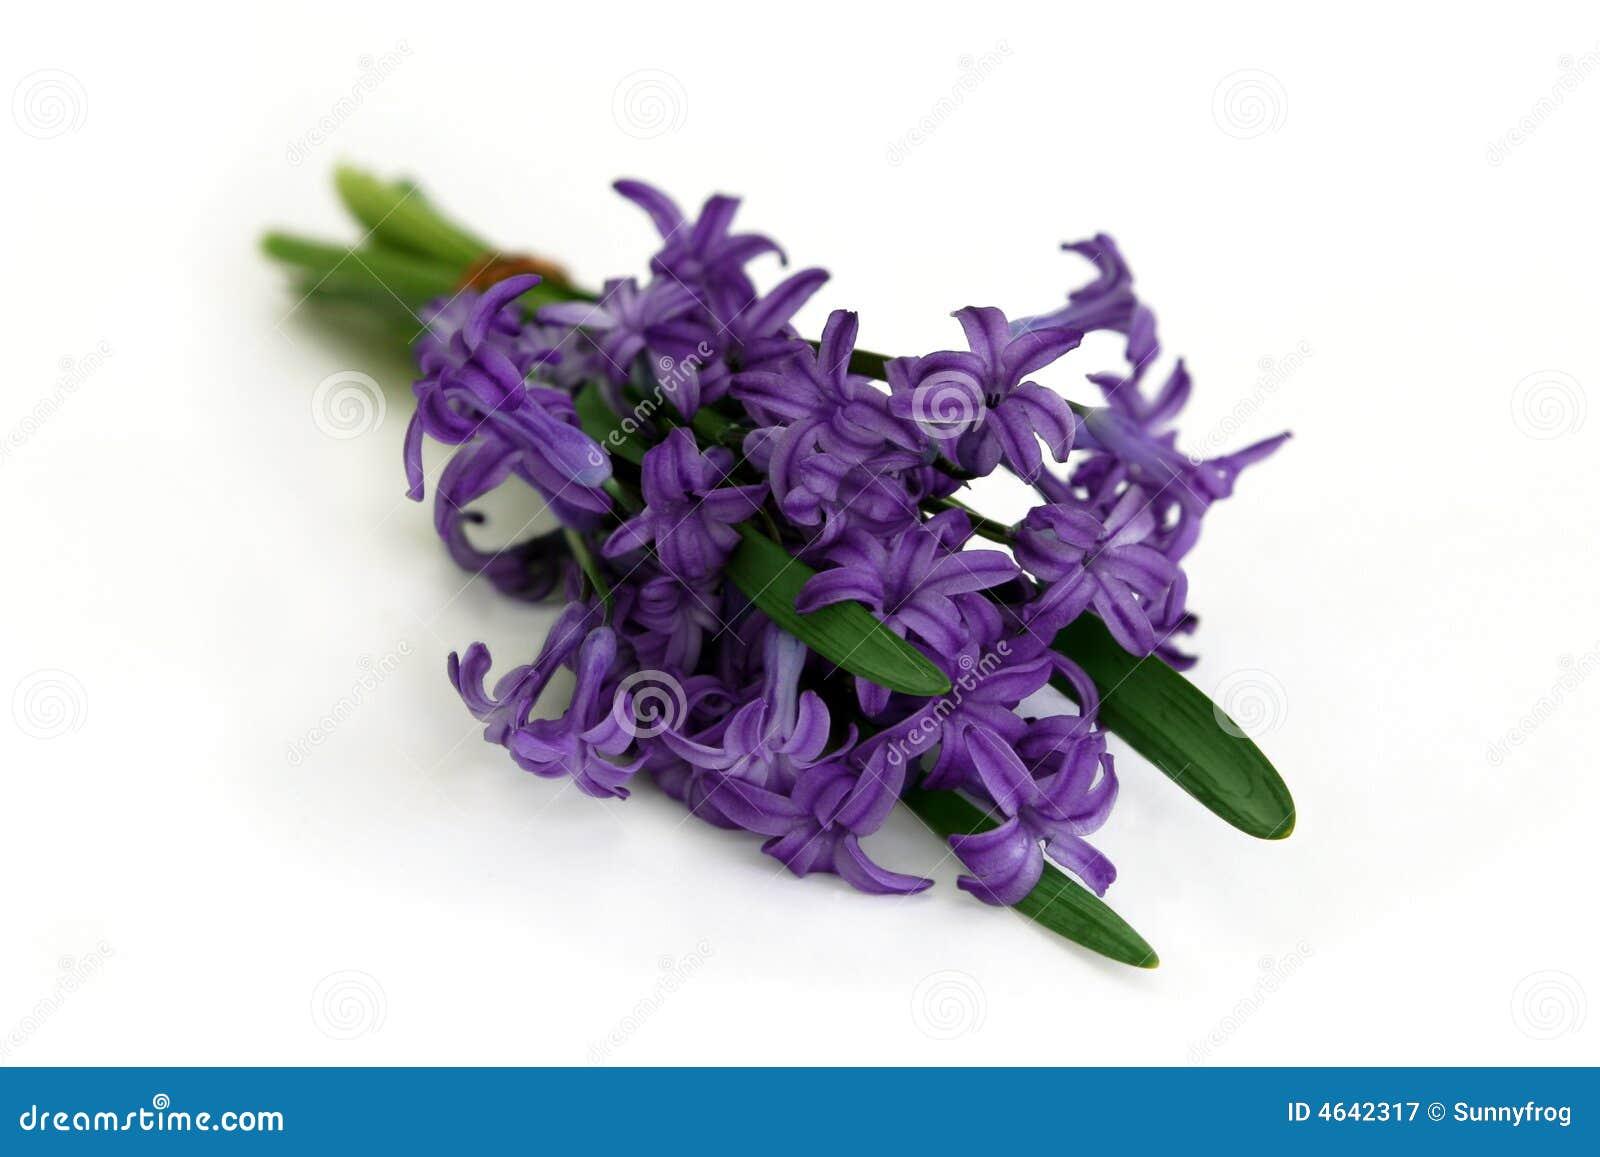 Bouquet of purple hyacinth stock photo image 39366558 bouquet of purple hyacinth royalty free stock photography dhlflorist Choice Image